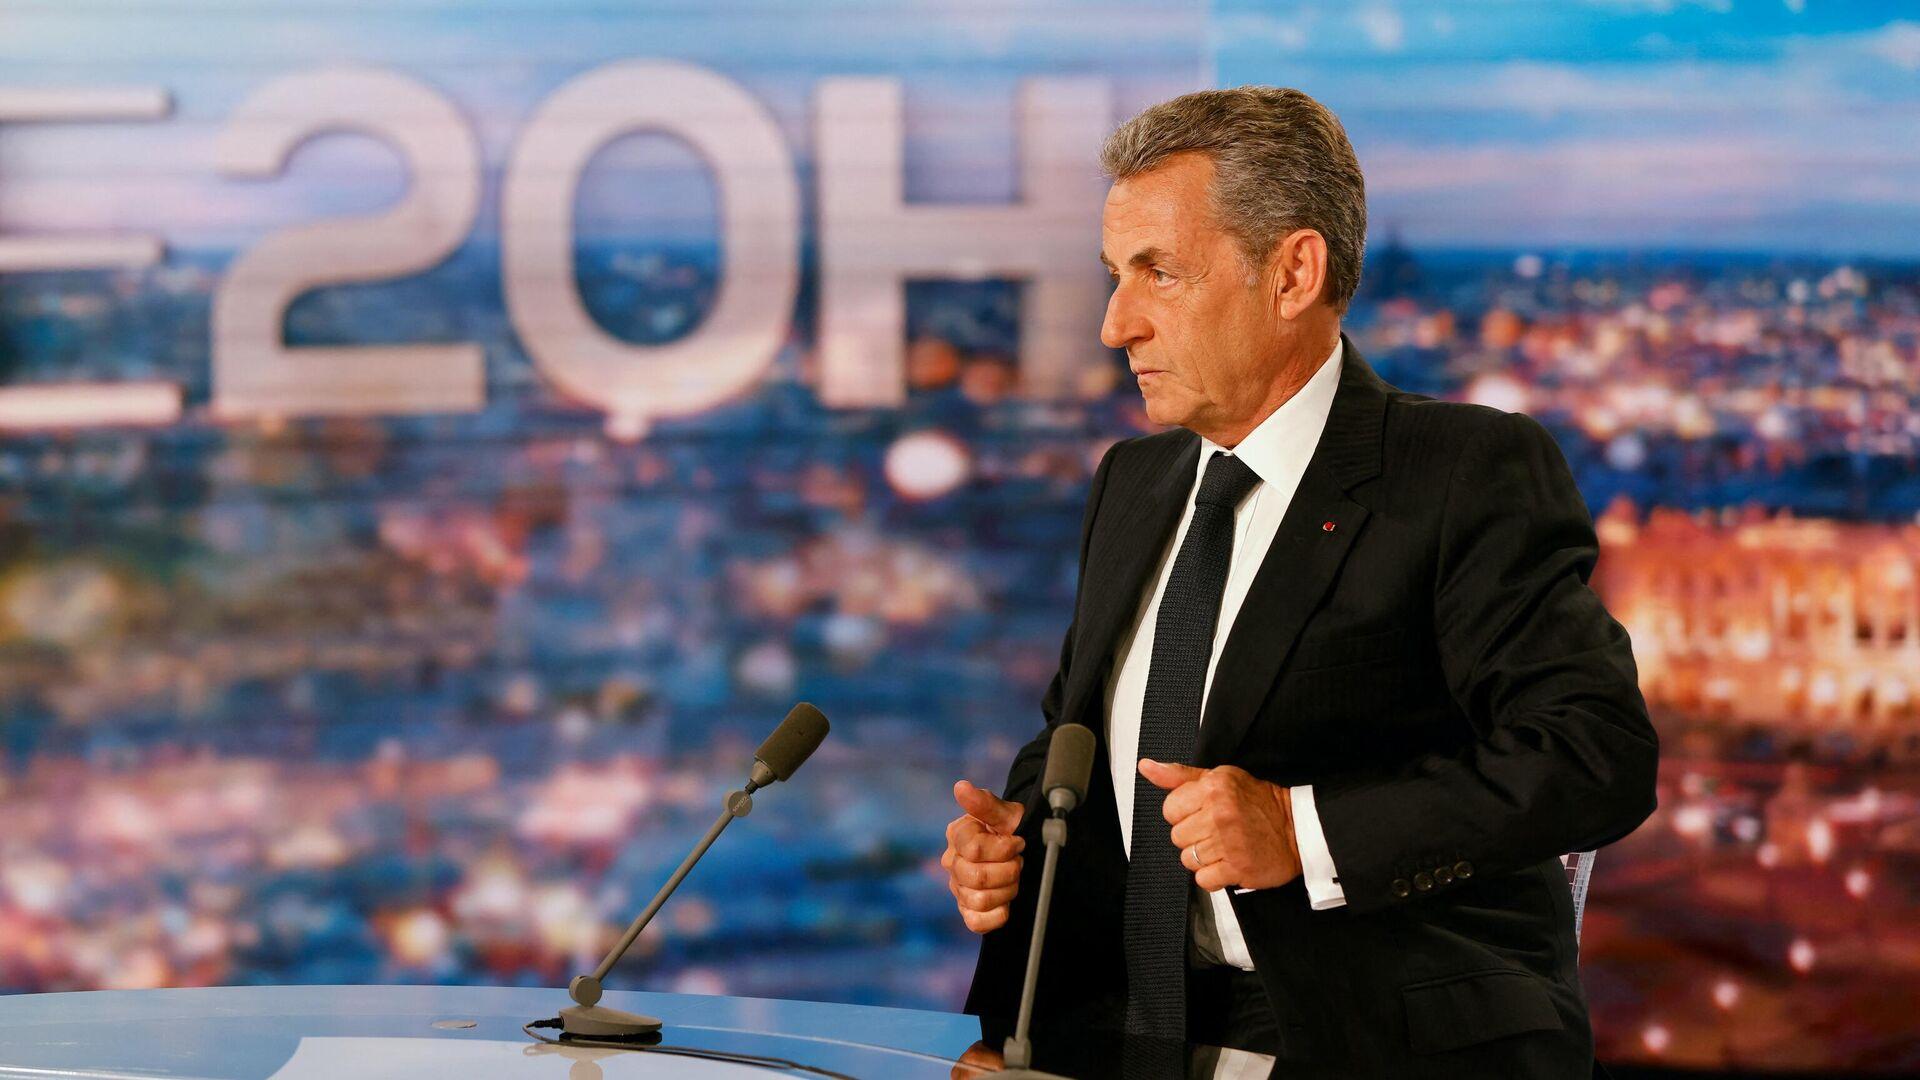 Nicolas Sarkozy, expresidente de Francia - Sputnik Mundo, 1920, 04.03.2021